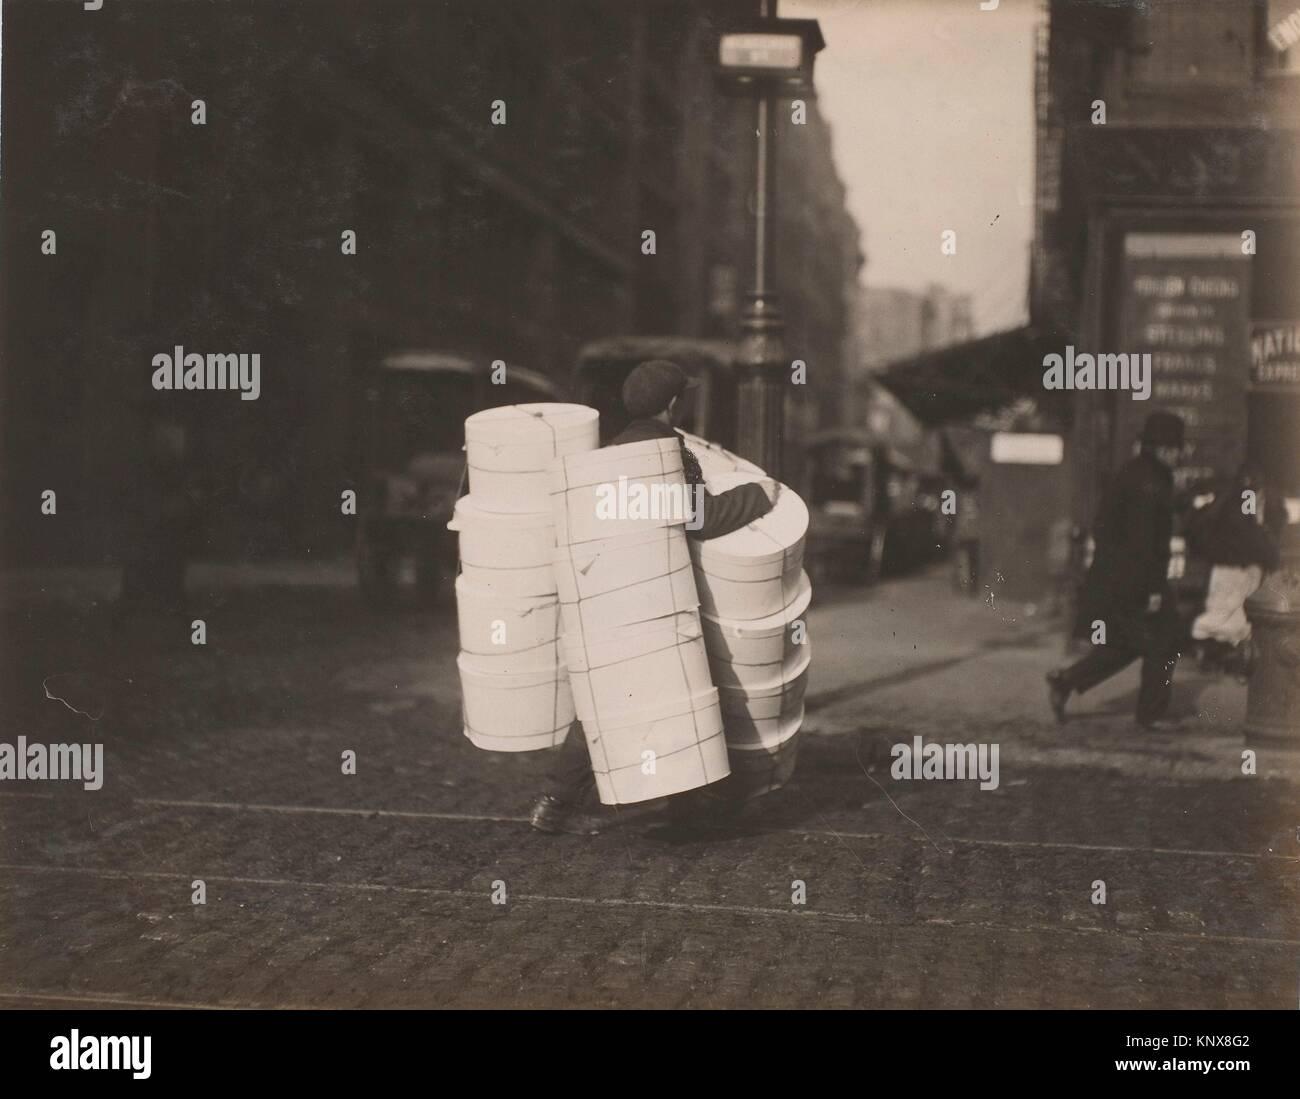 Boy carrying hats. Blee[c]ker St., N.Y. Artist: Lewis Hine (American, 1874-1940); Date: February 1912; Medium: Gelatin - Stock Image